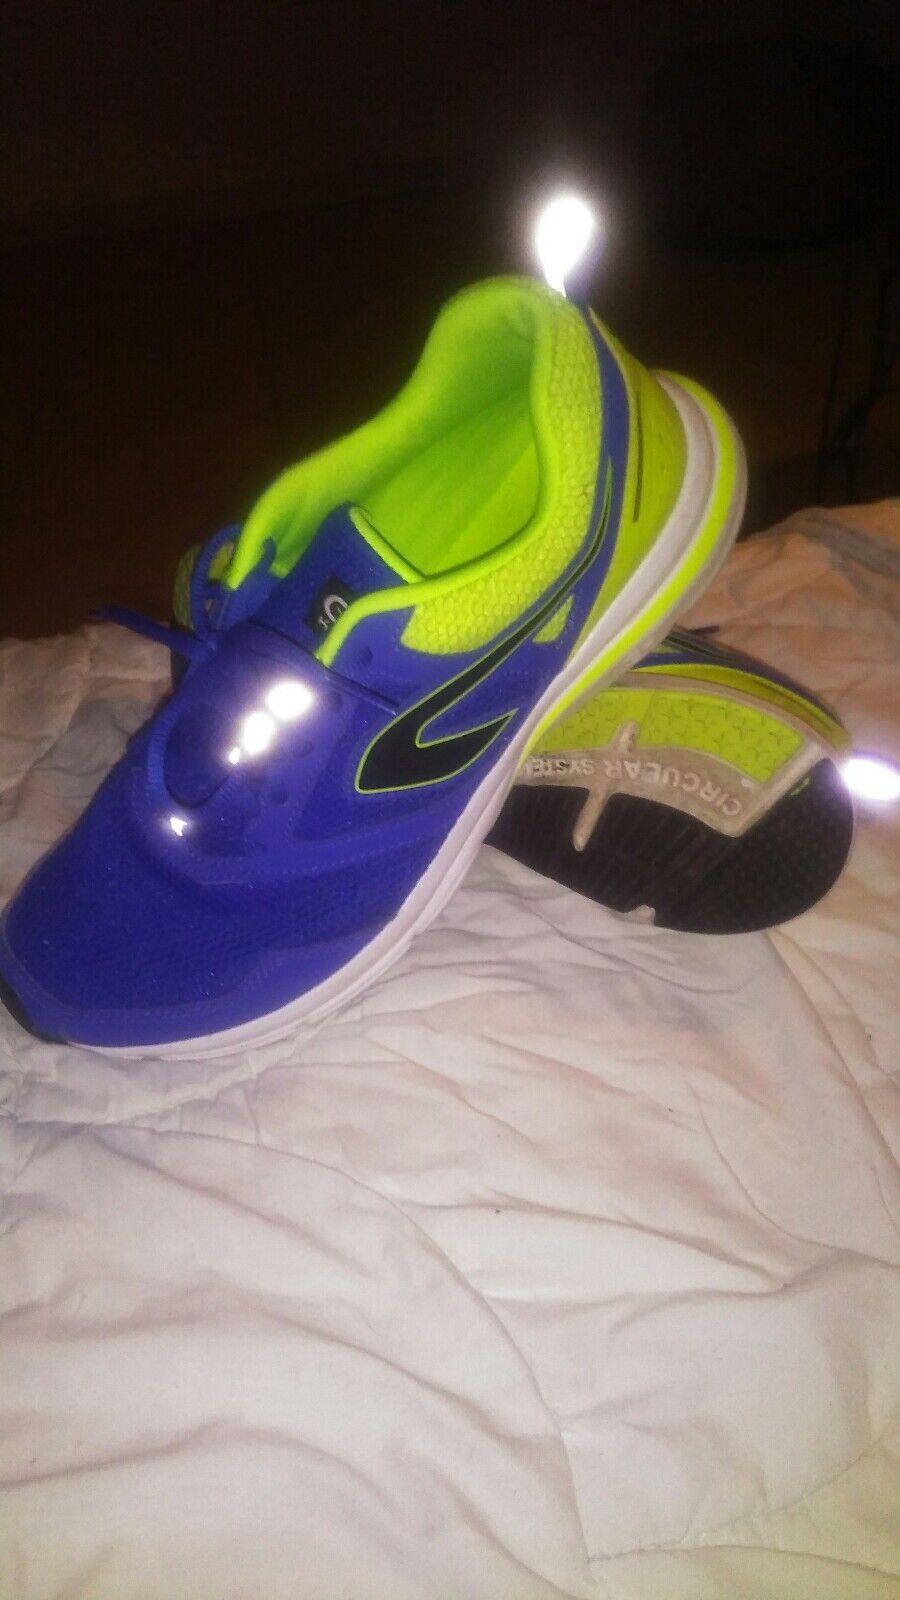 De Neon Bleu Course Chaussures Kalenji Homme Sport qSagwnUA